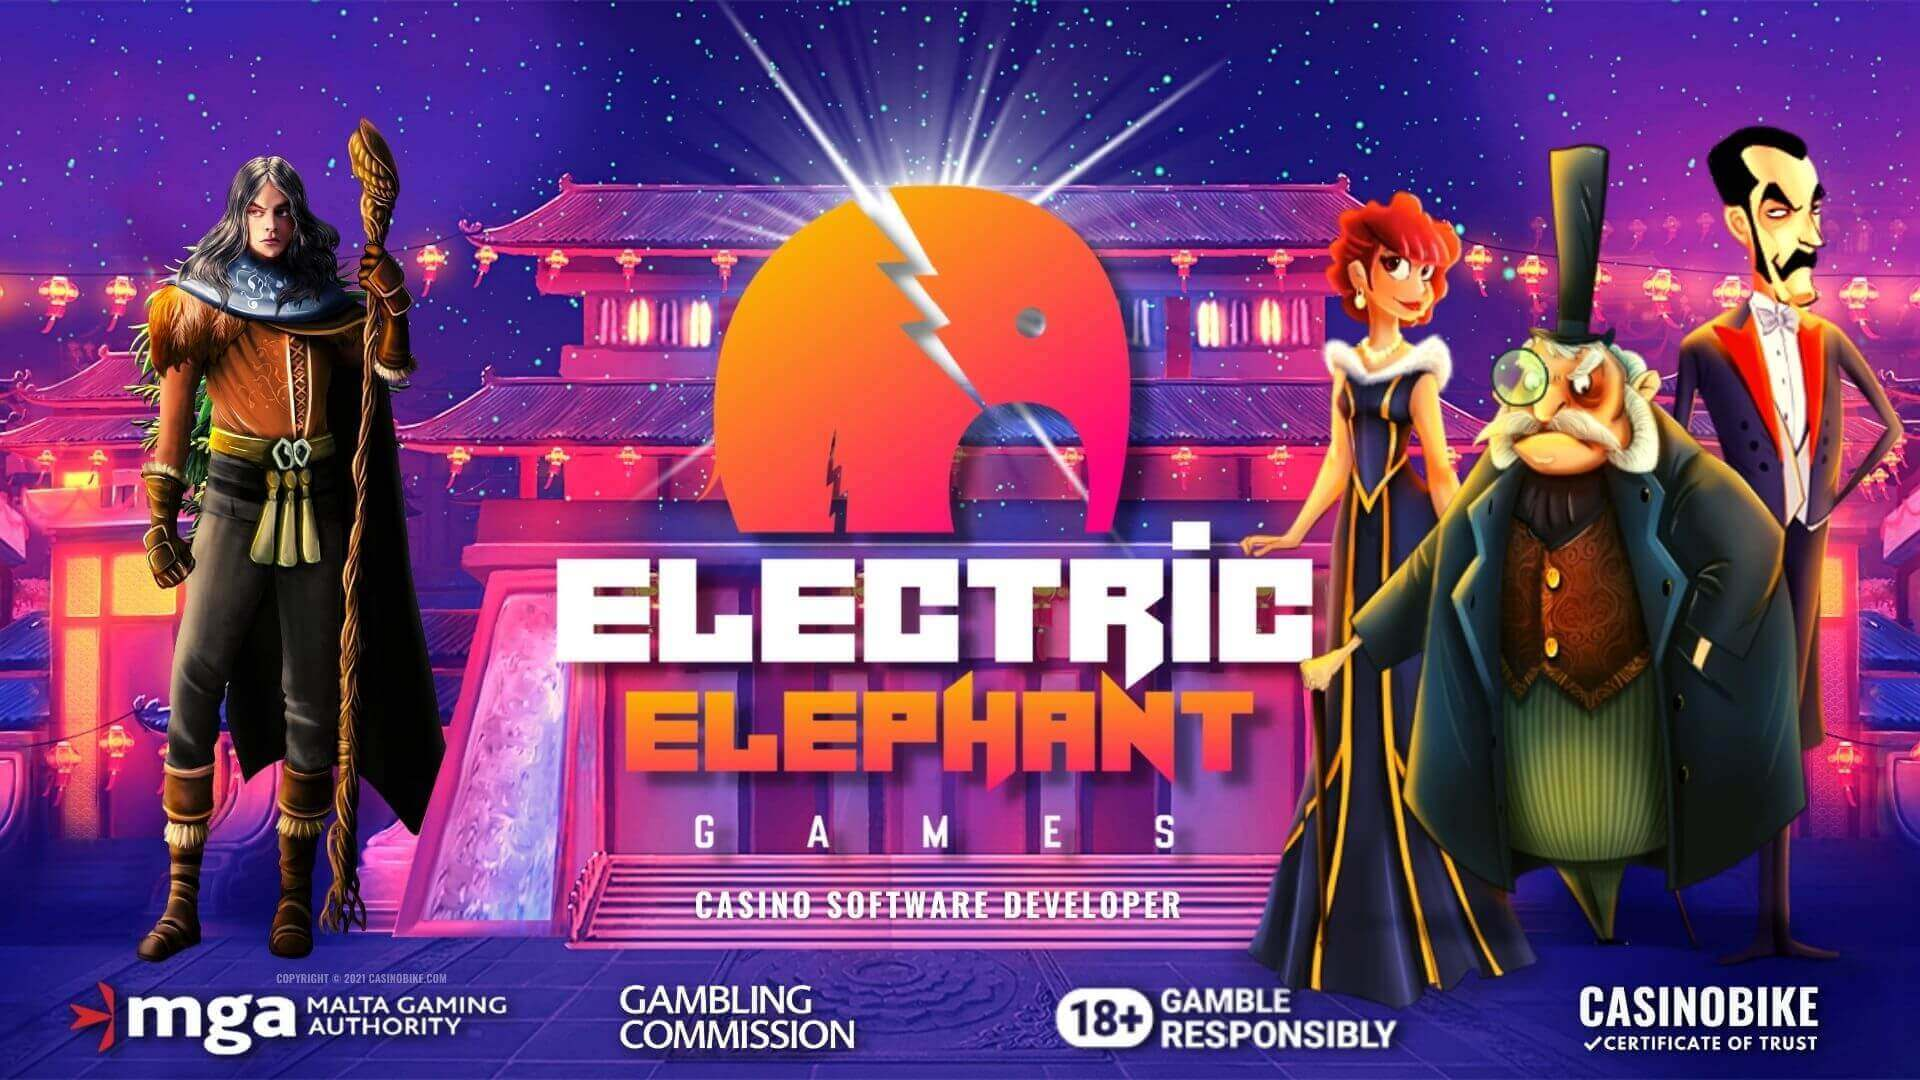 Electric Elephant Online Casino Software Developer